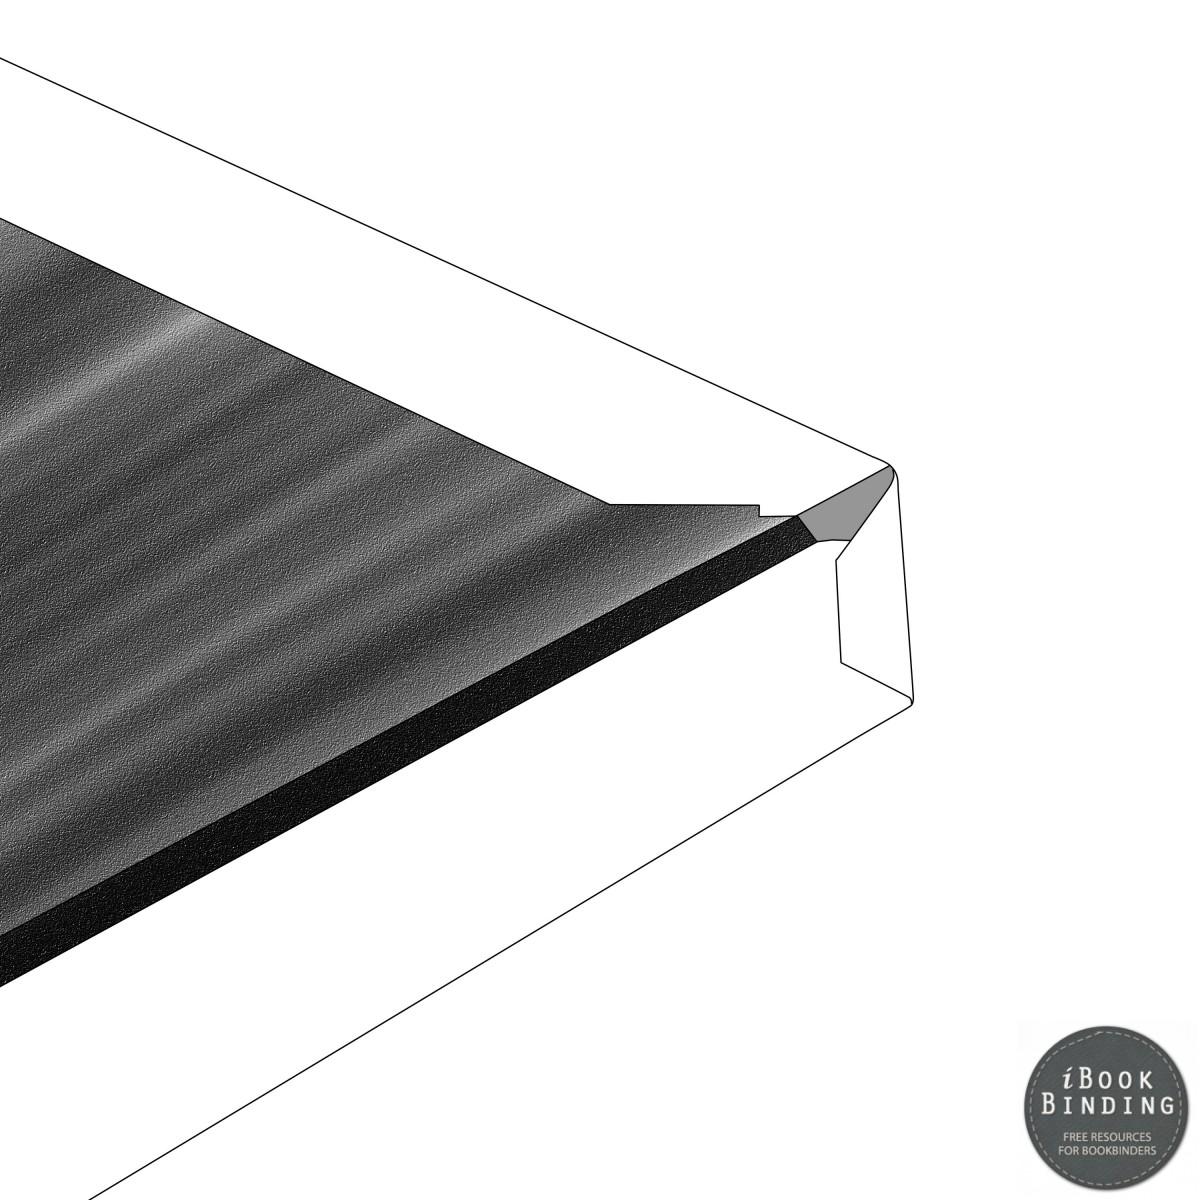 97 - Folding over edge of bookbinding turnover sheet to make corners